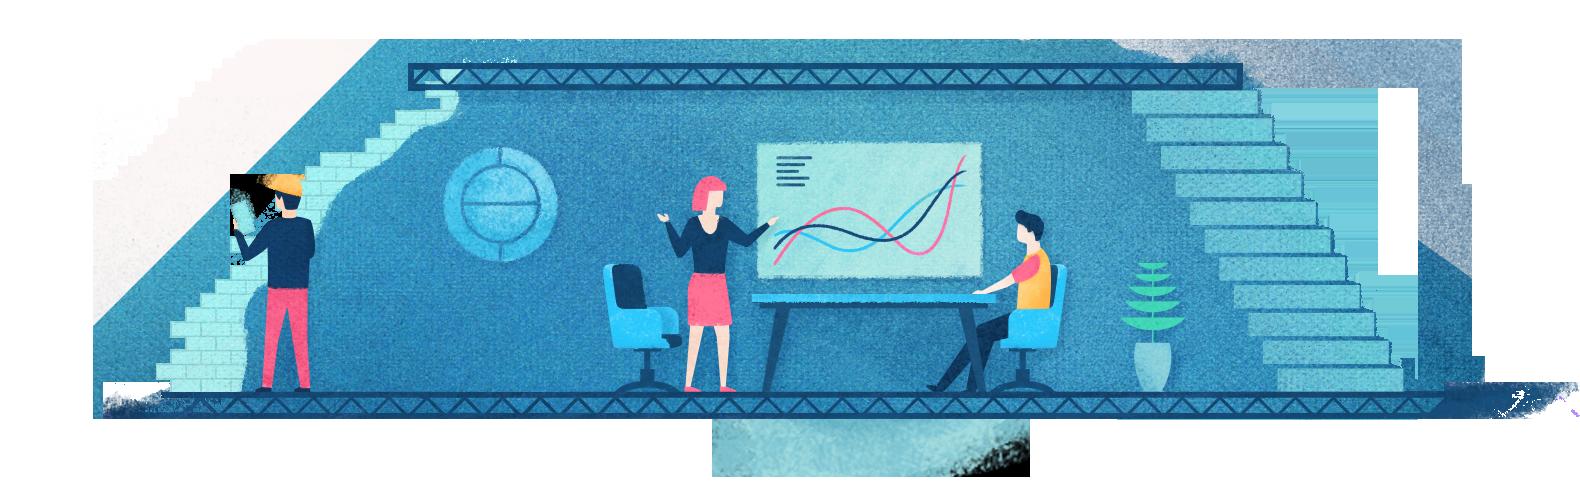 Startup Unicorn analyzing customer data in their decision-making